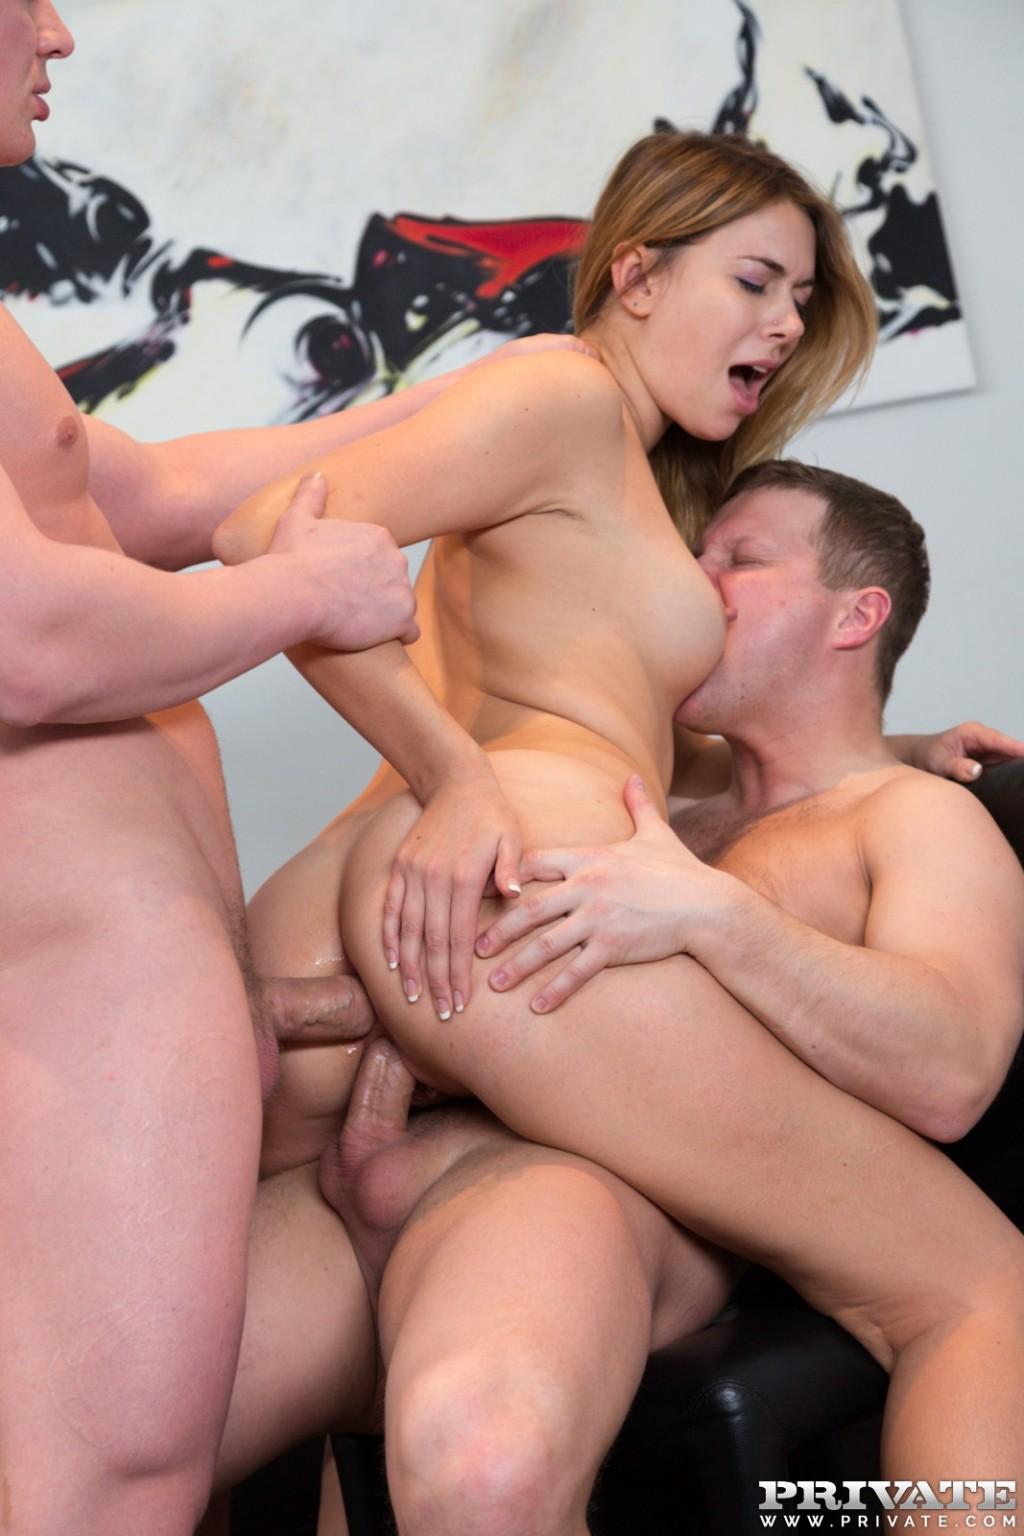 Big Tits Big Ass Hardcore